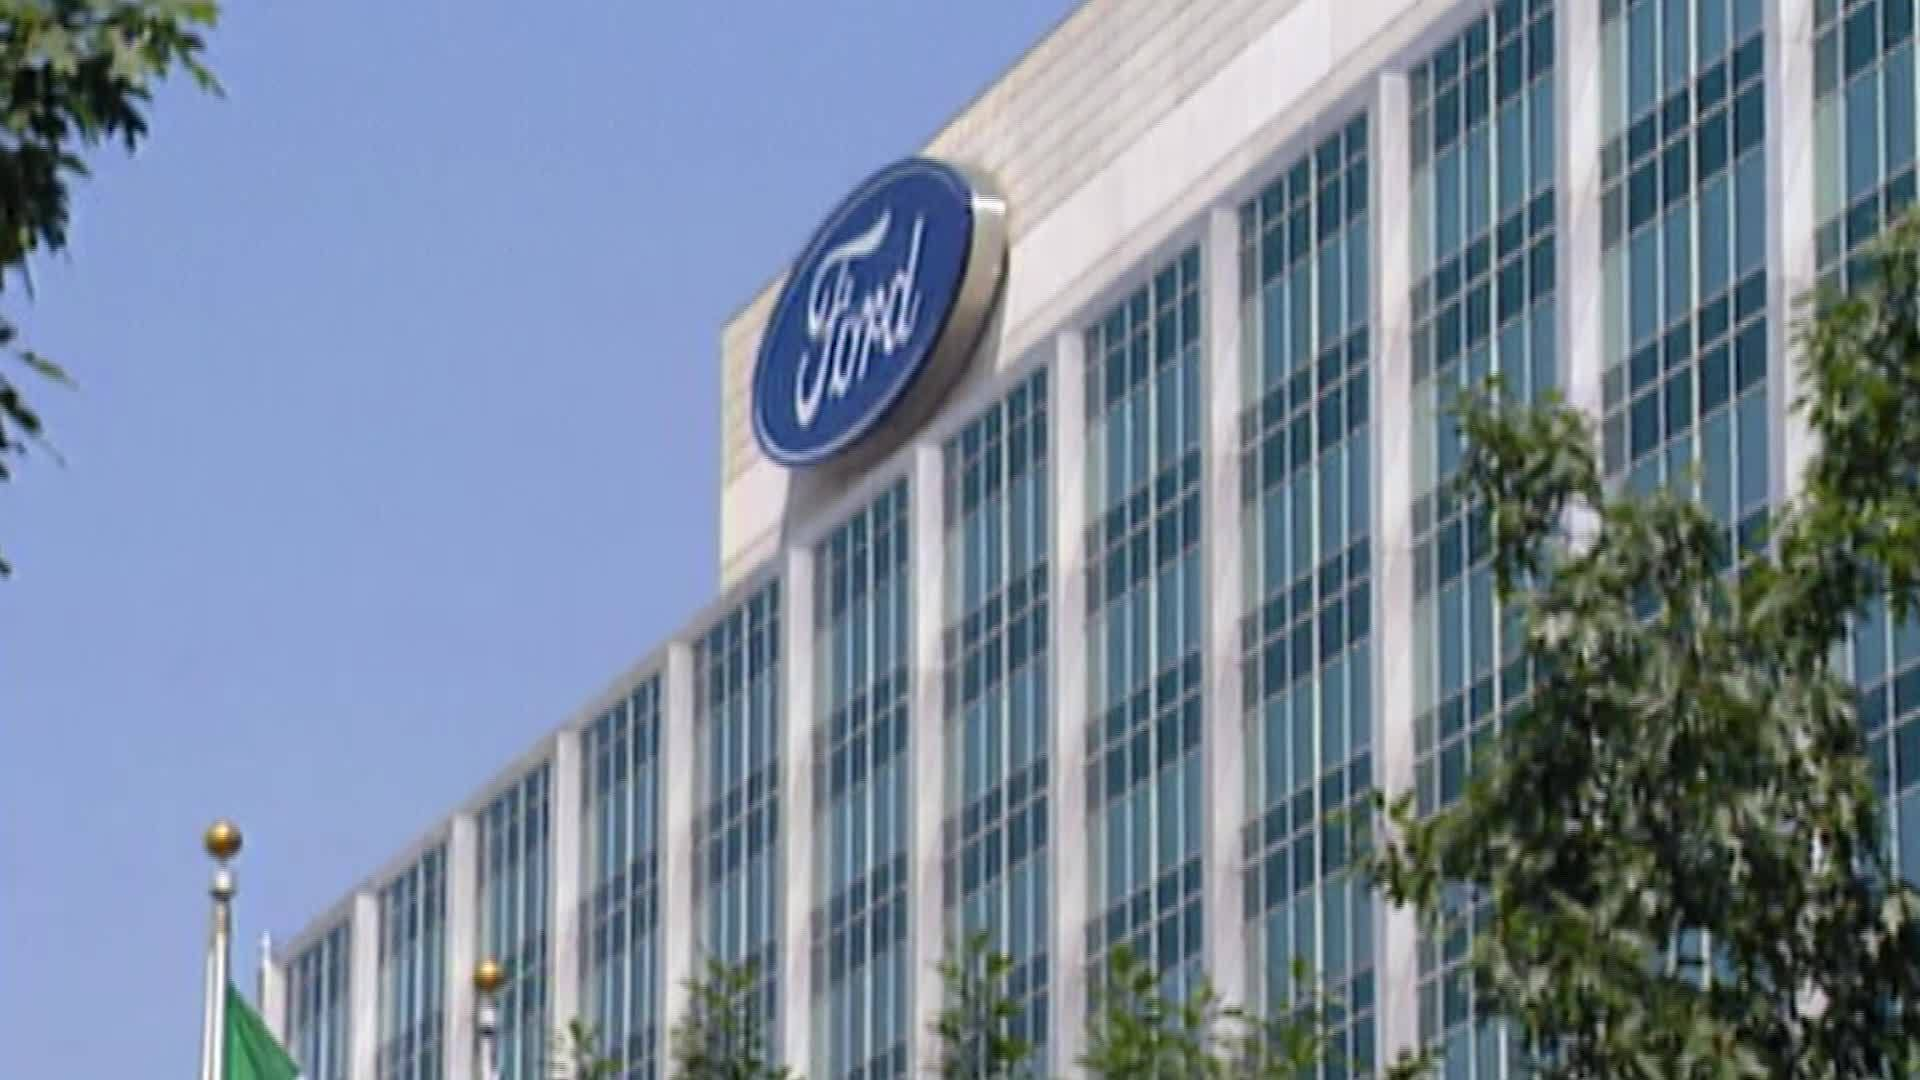 Ford_recalls_1_5_million_pickups_that_ca_4_20190213182145